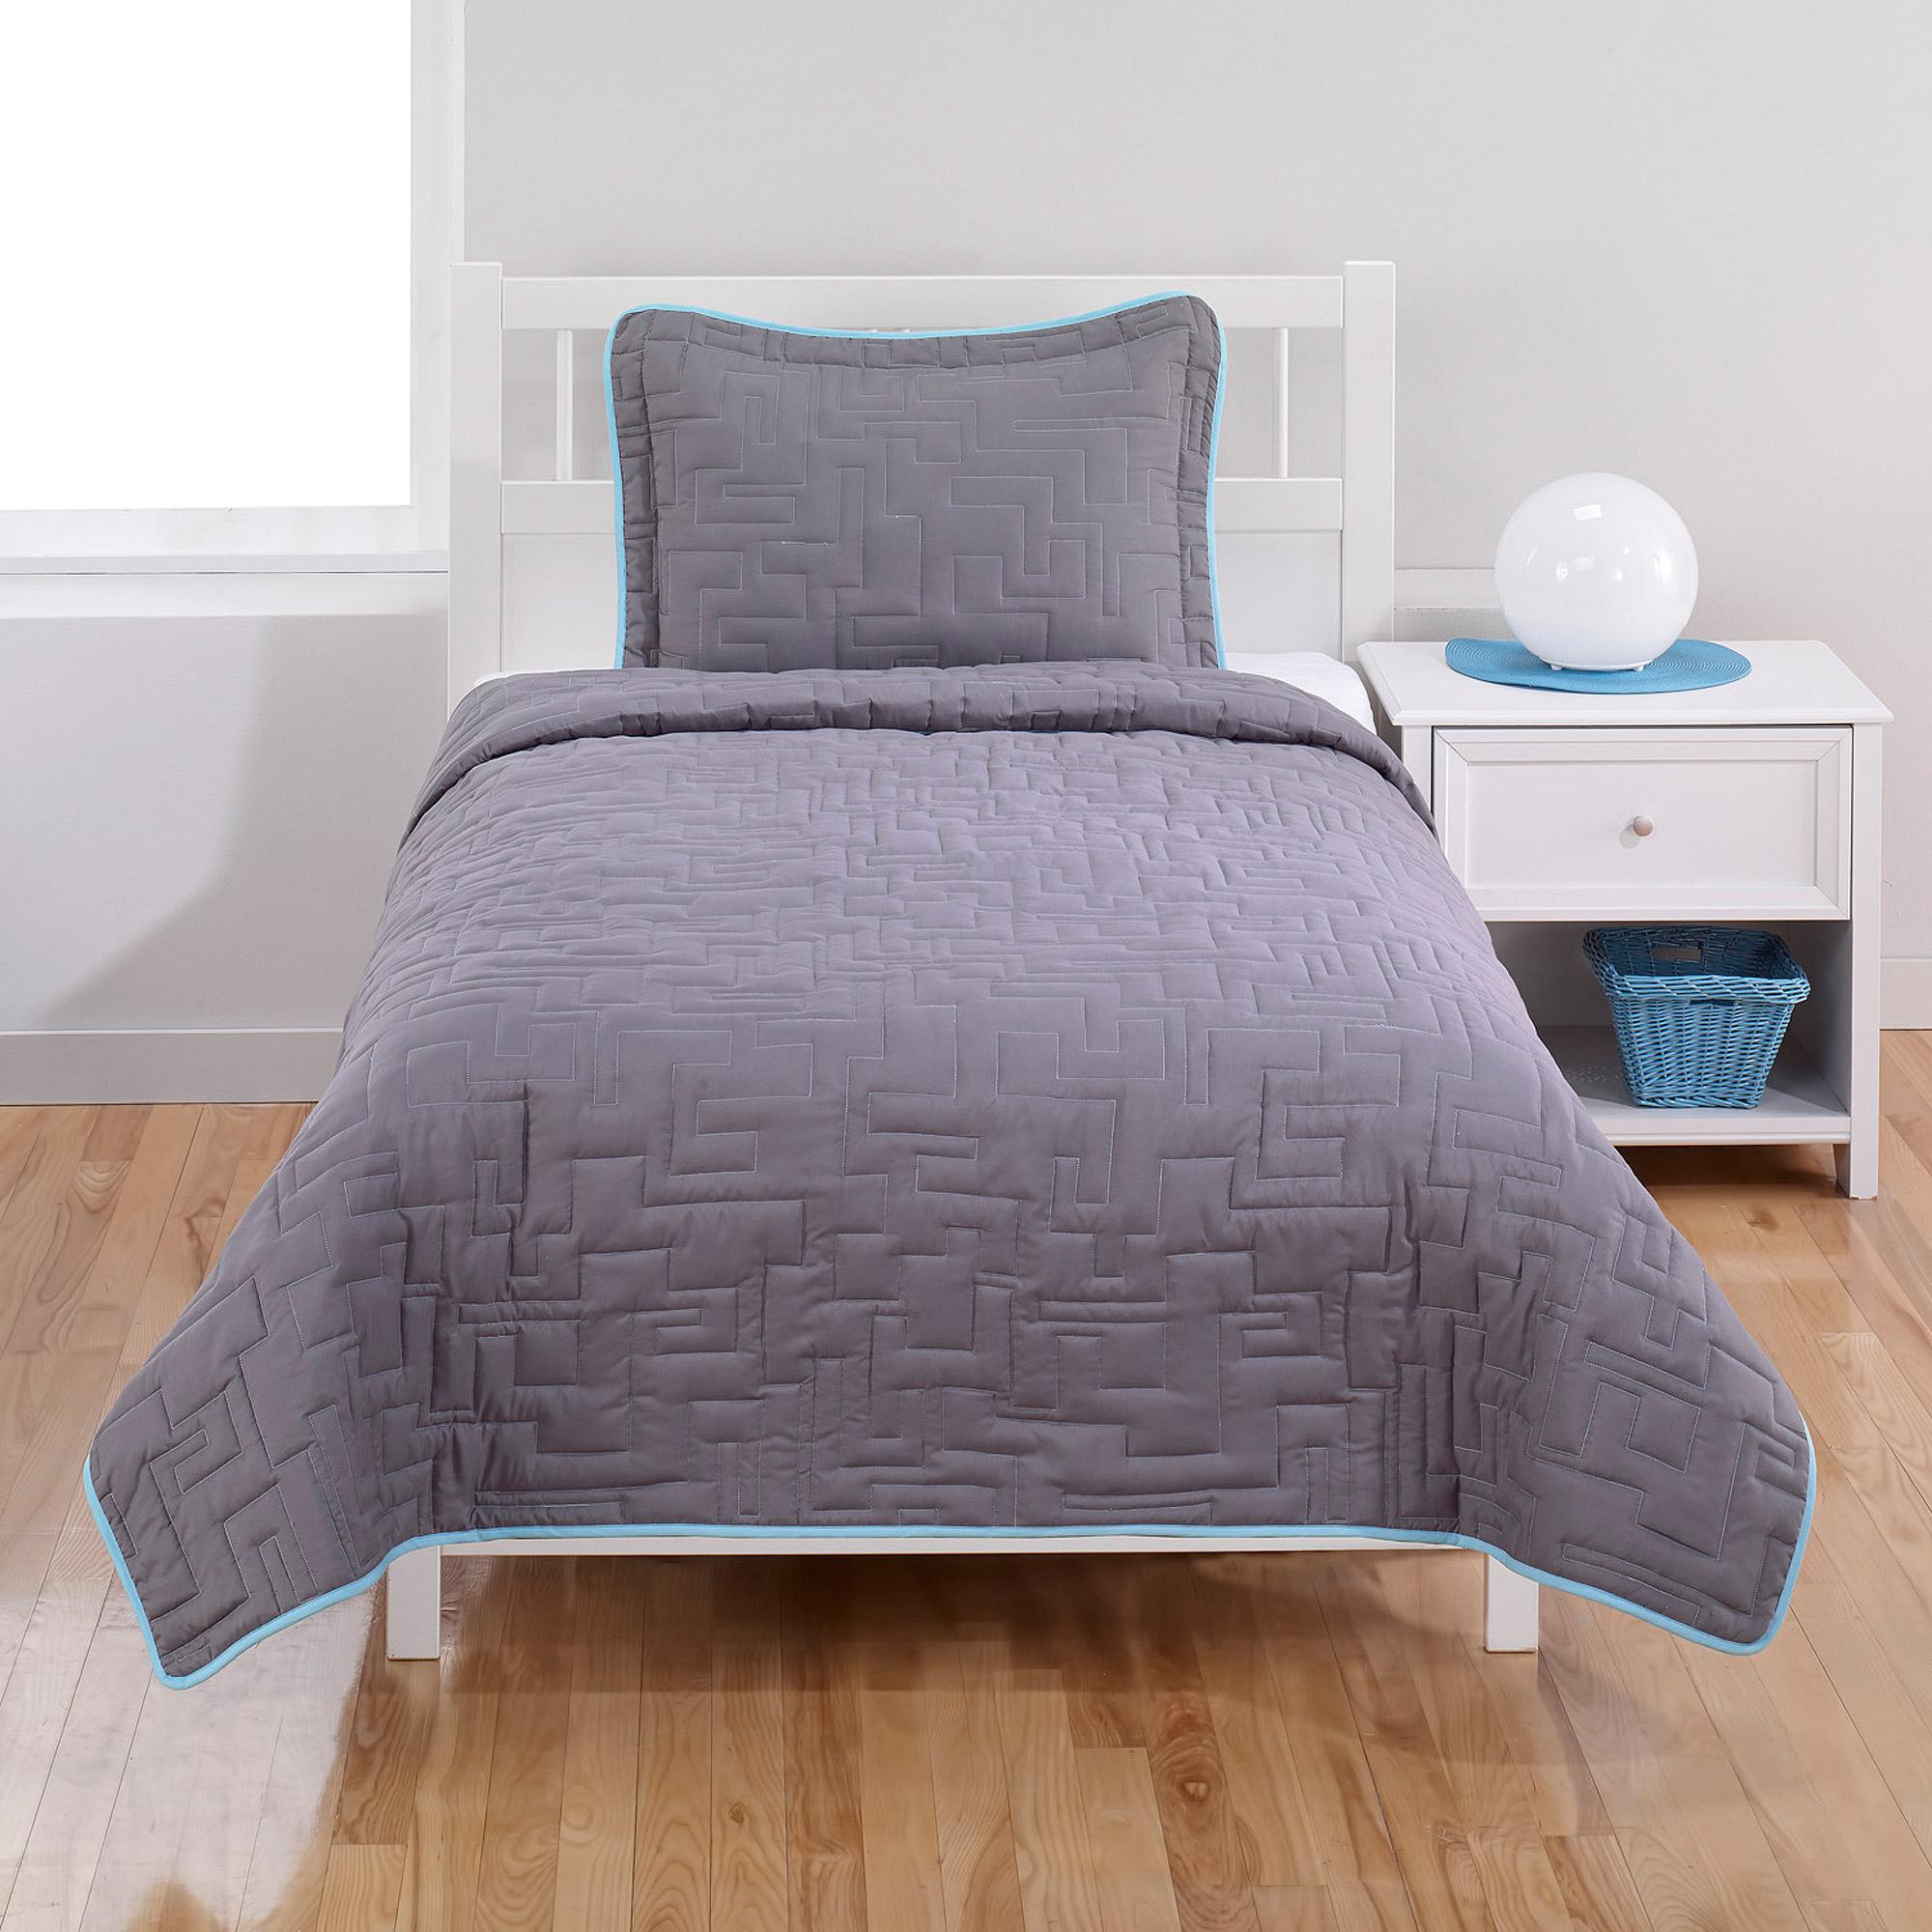 Maze Bedding Quilt Set